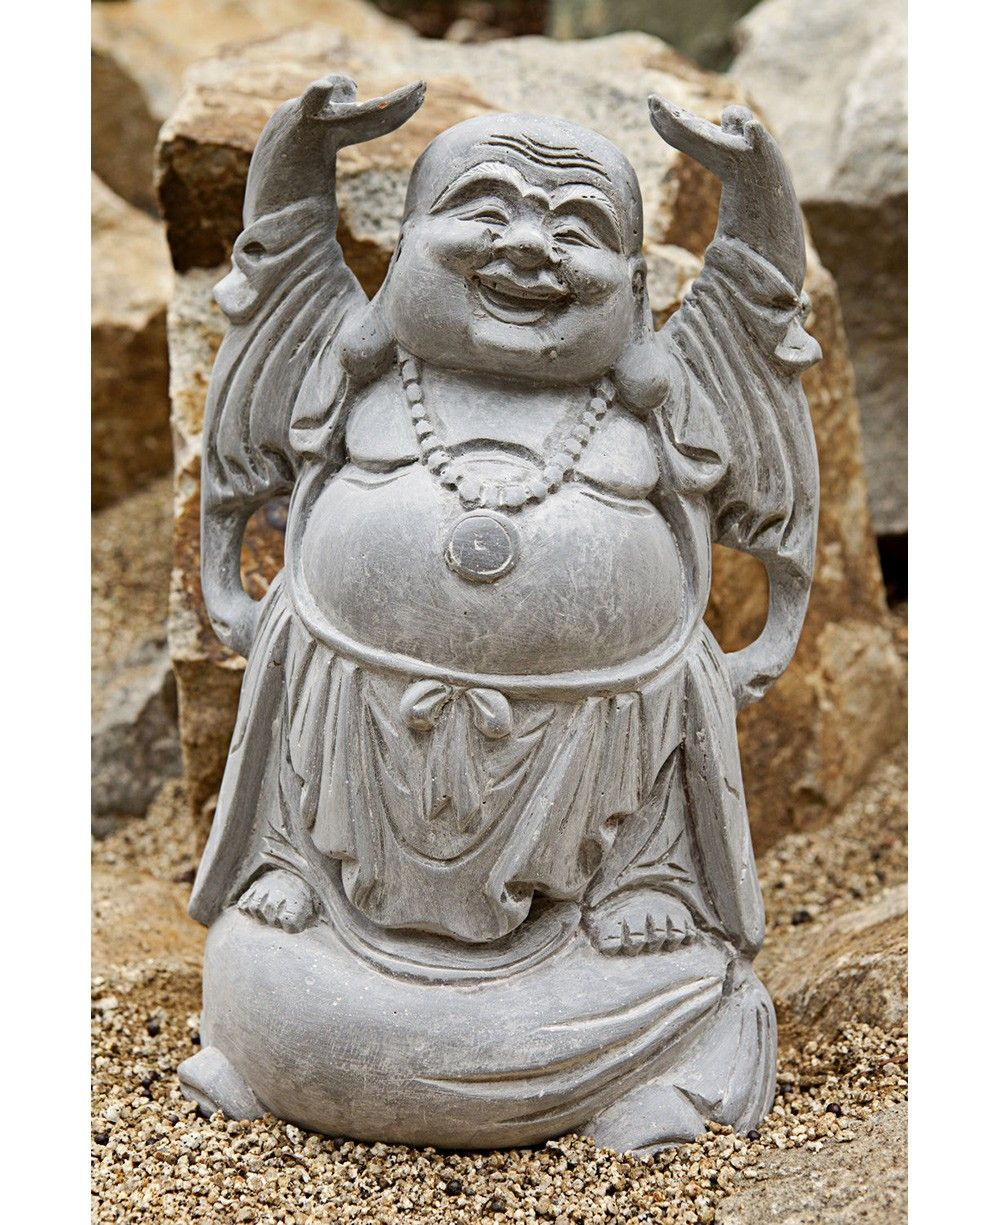 Buddha Statues For The Garden: Joyful Happy Buddha Garden Statue Made Of All-weather